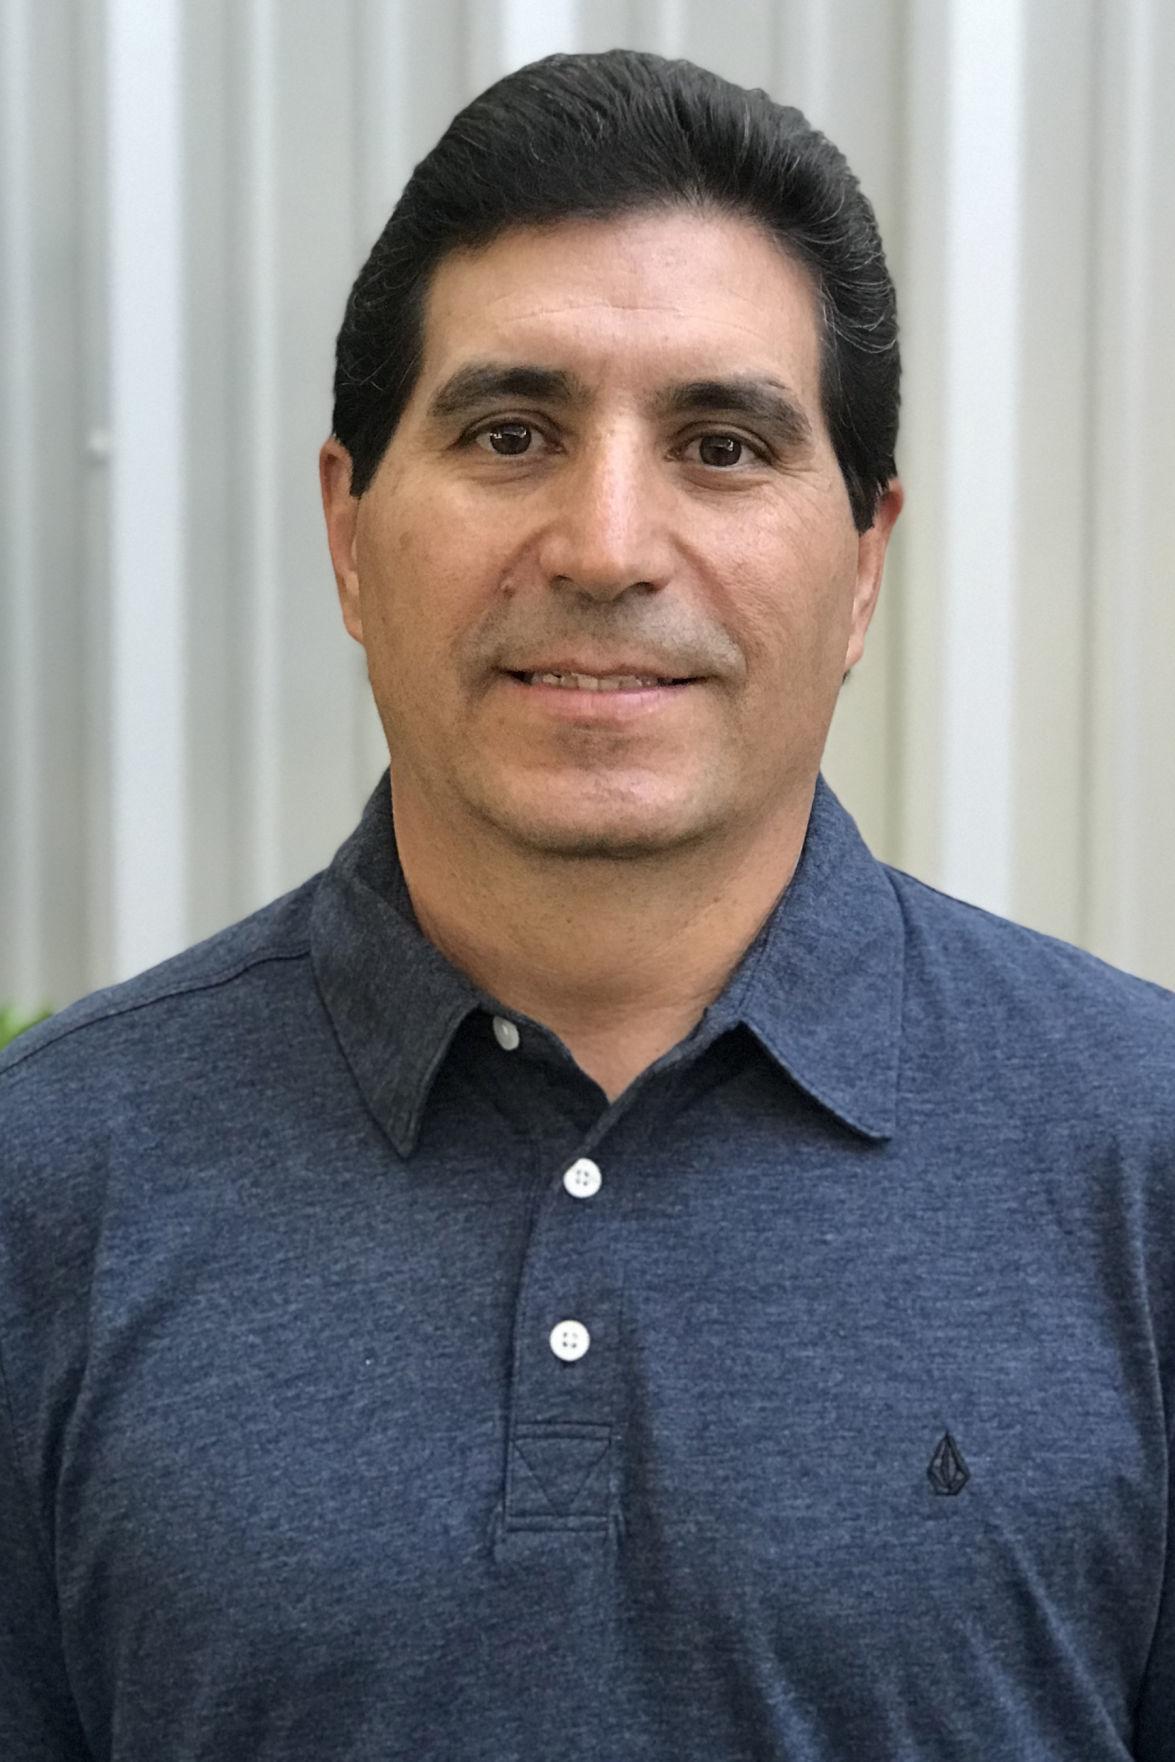 Elections: Vince Palomar